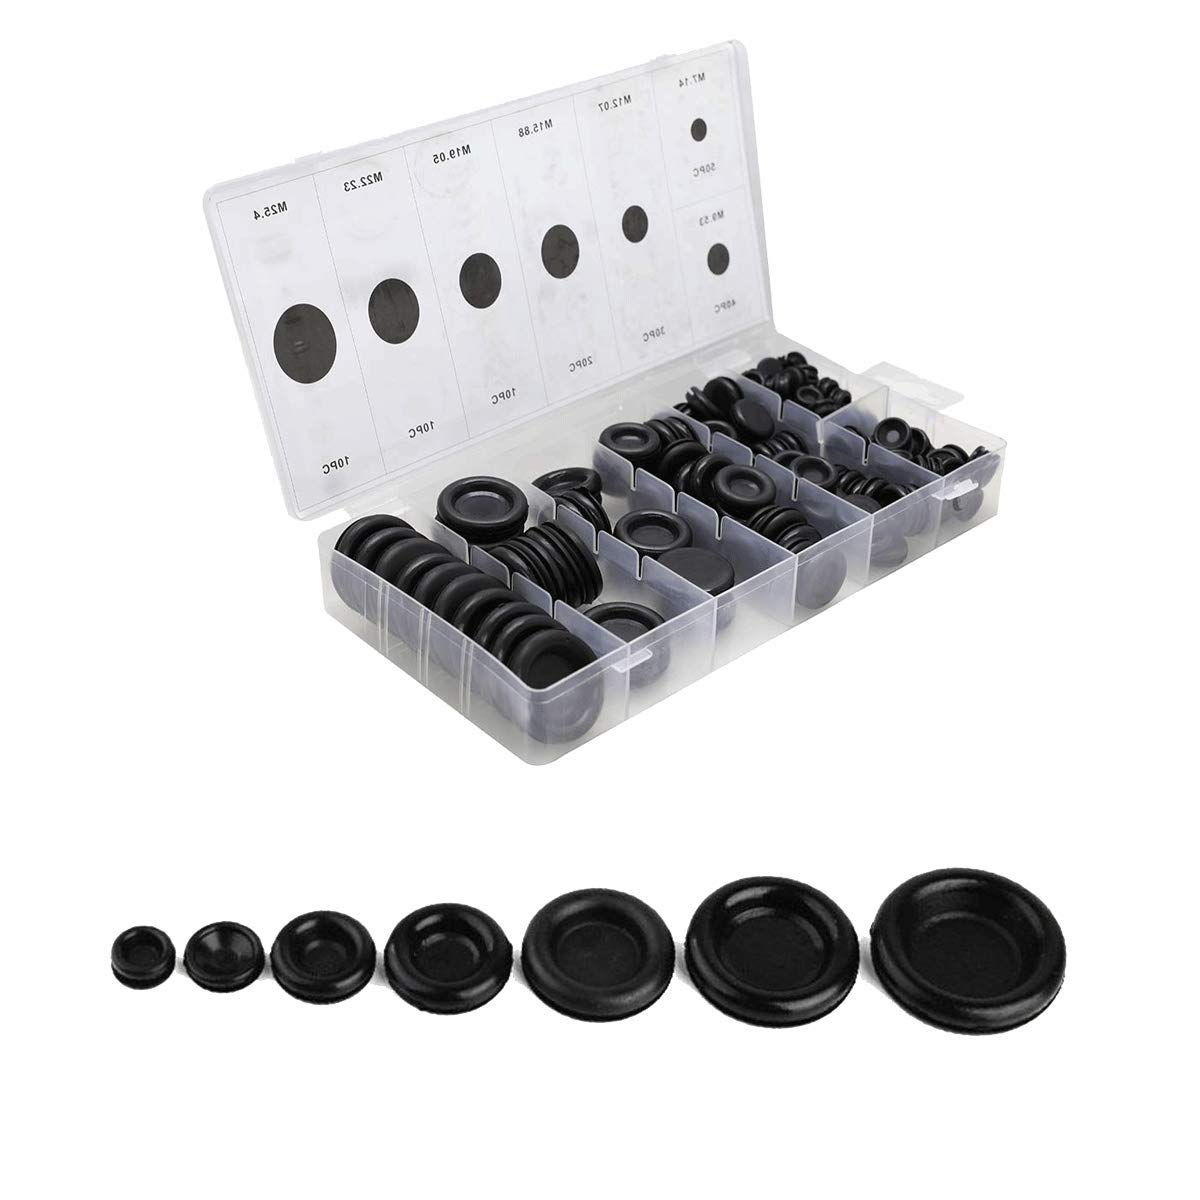 170 PCS Rubber Grommet Firewall Hole Plug Set Electrical Wire Gasket KitRubber Gasket Kit by 170 PCS